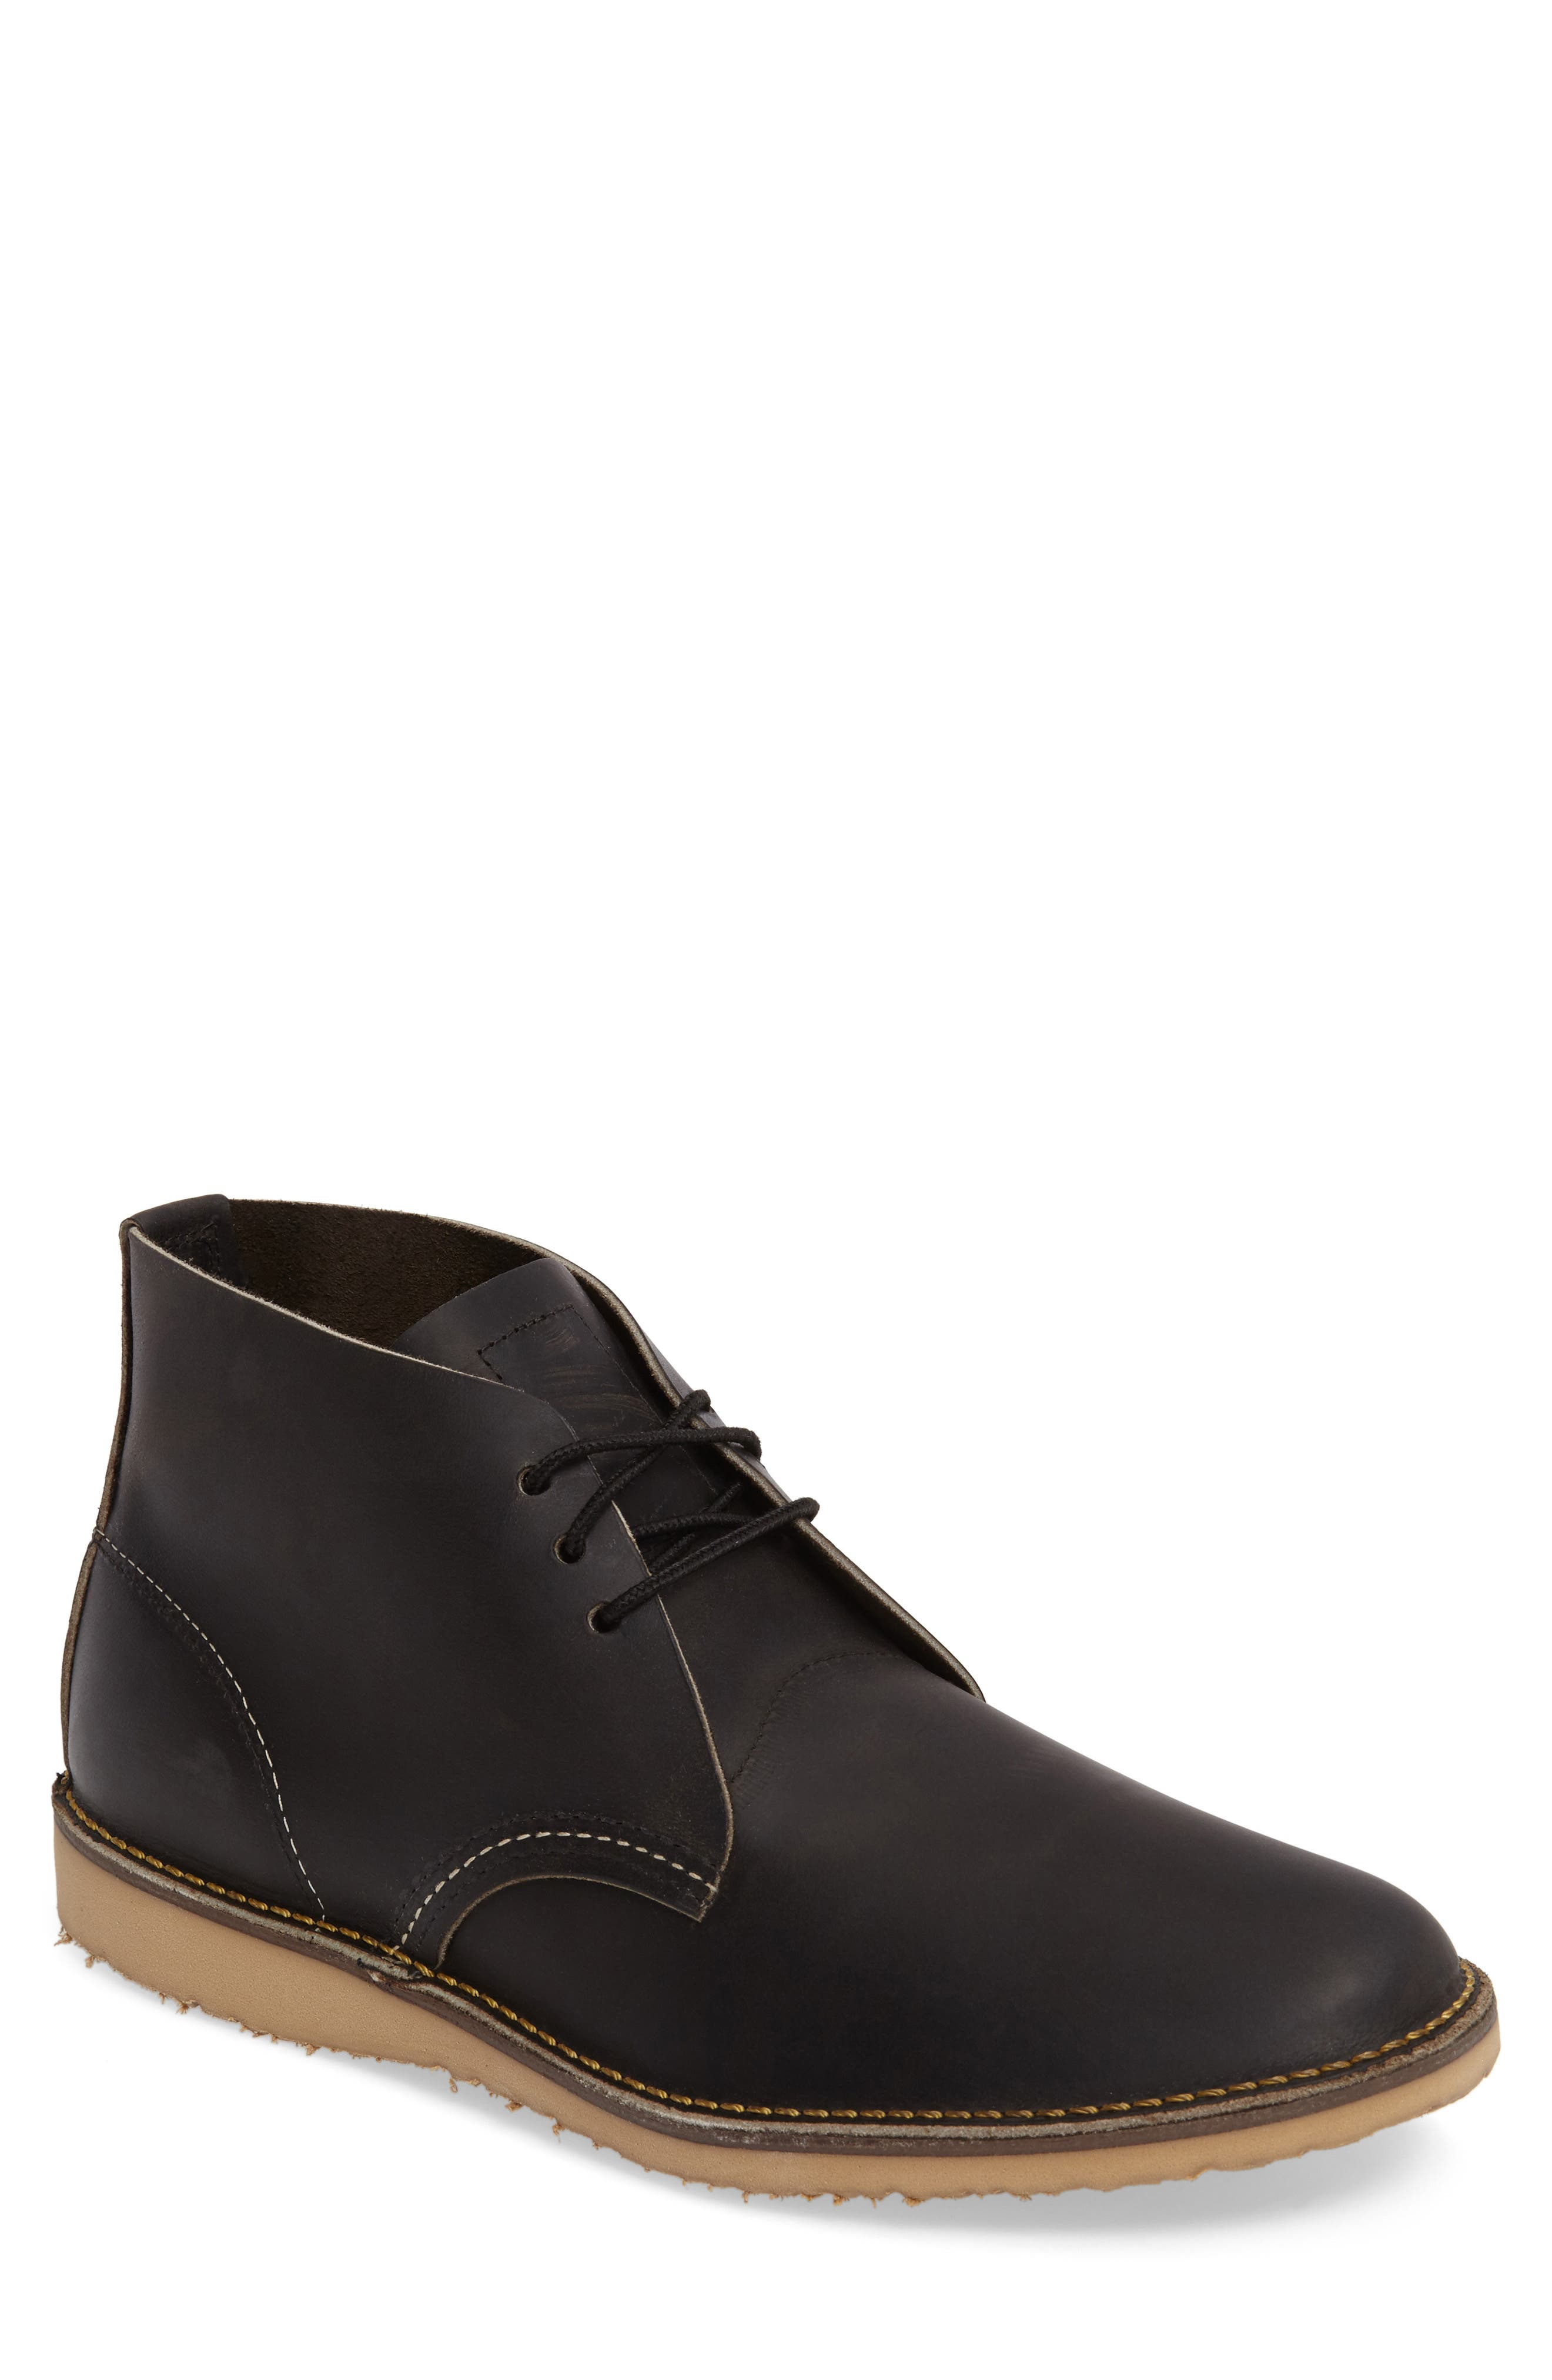 Chukka Boot,                         Main,                         color, 020